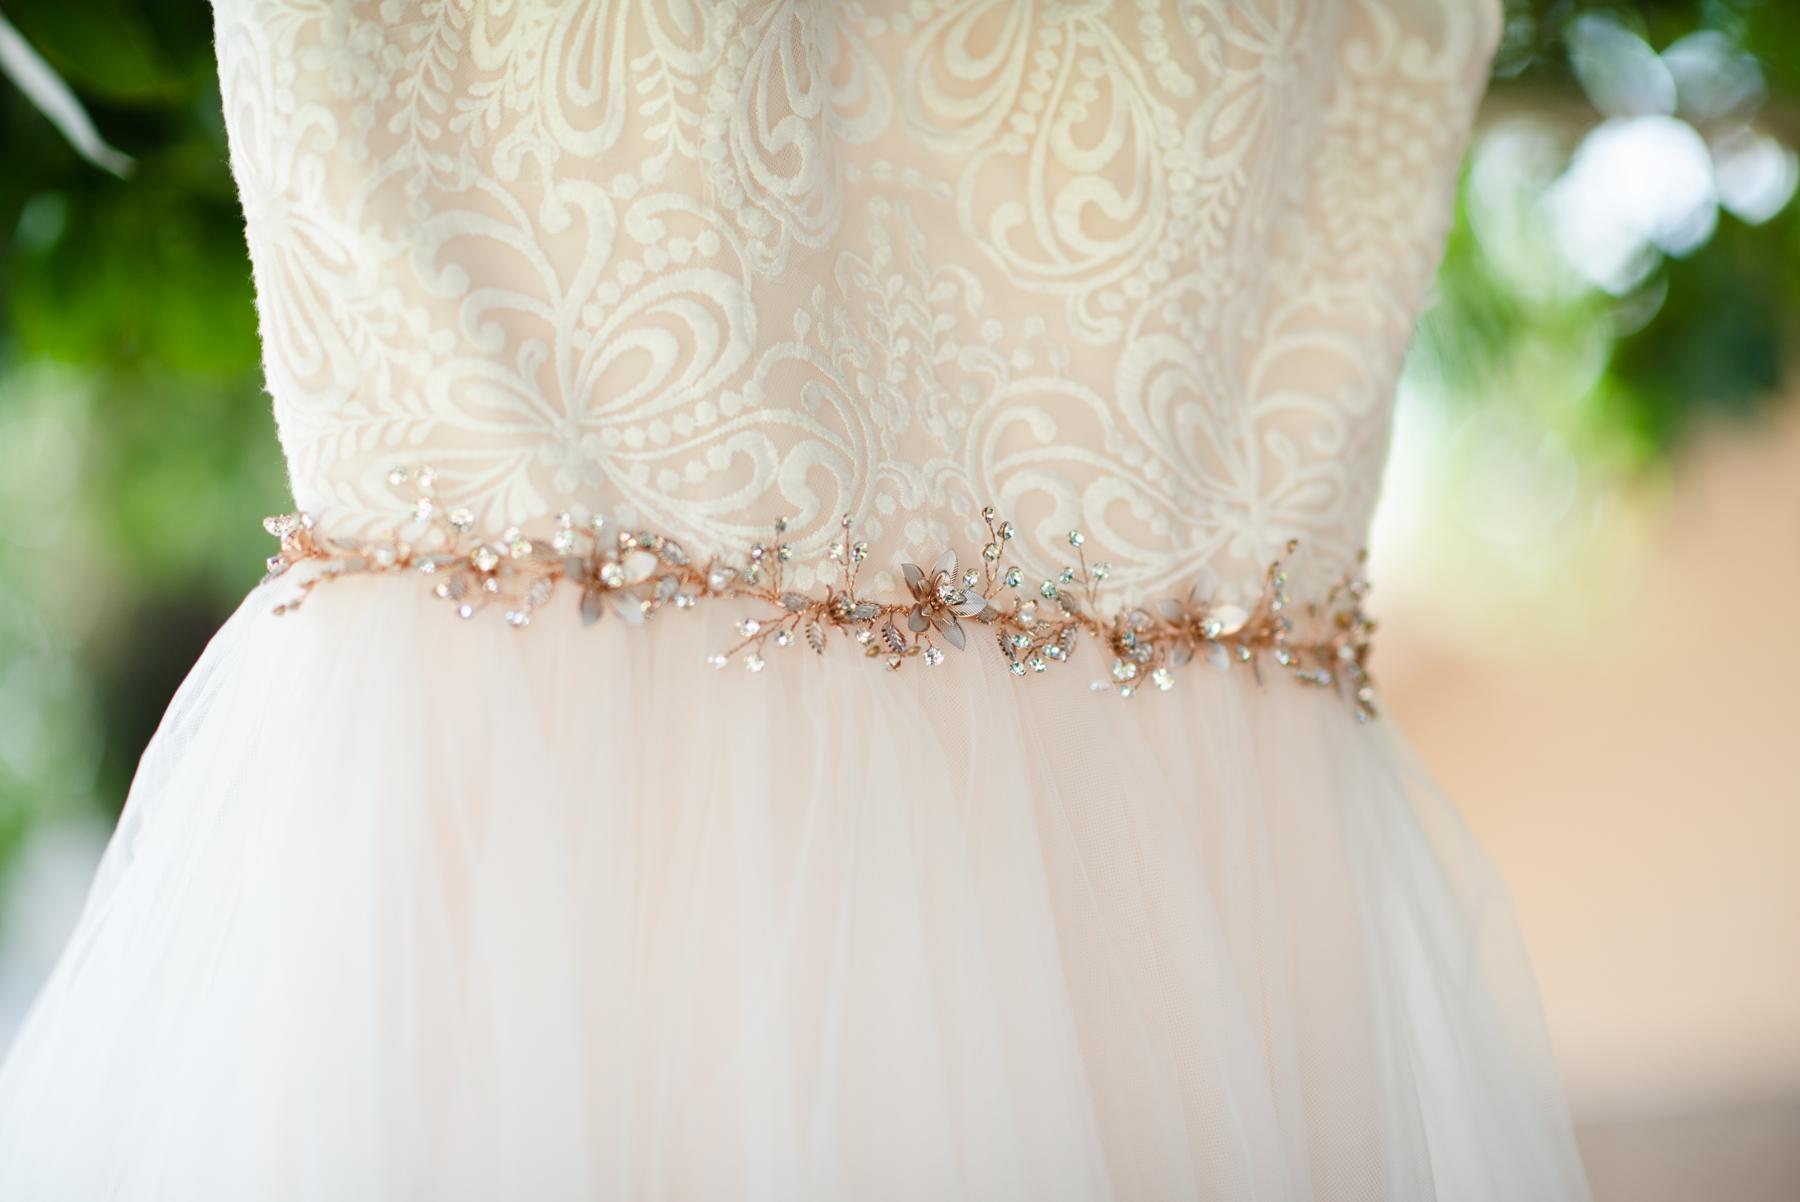 Bella Rose Estate Wedding - Meredith Amadee Photography-15.jpg